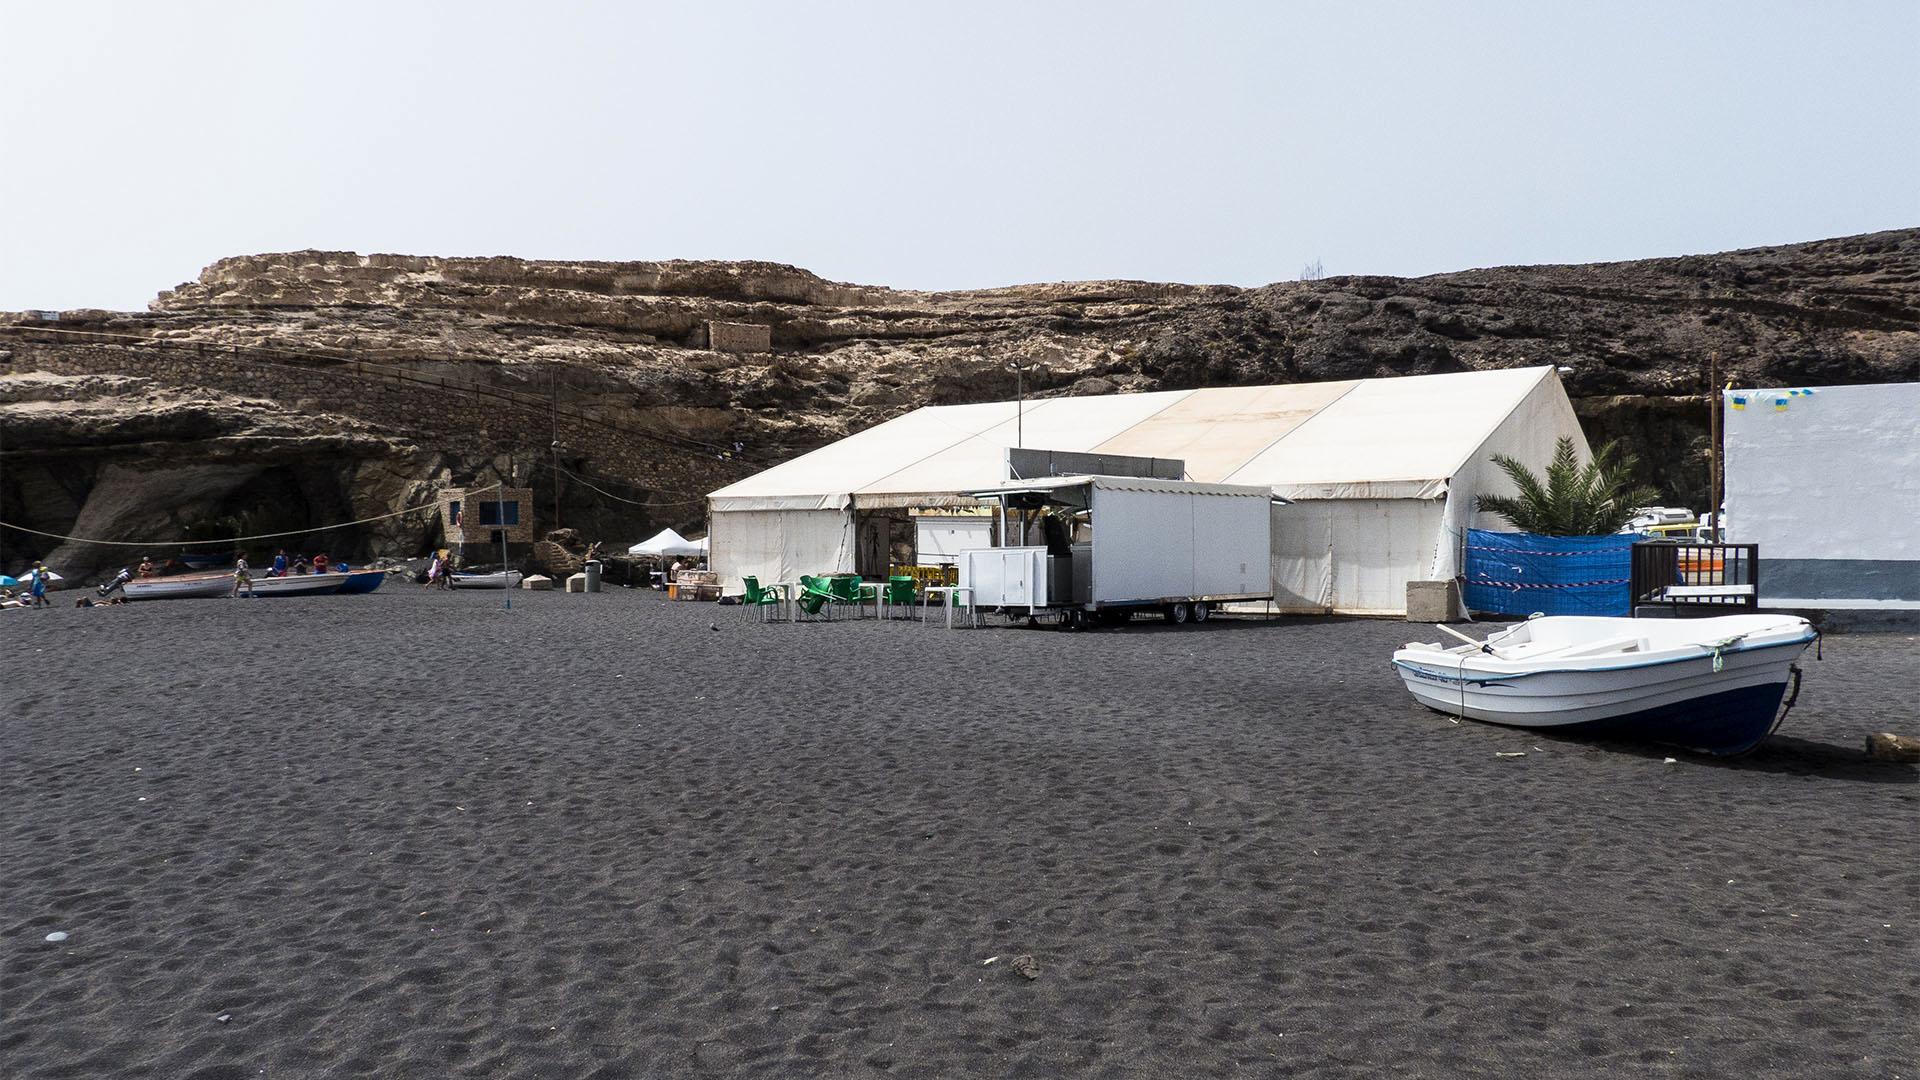 Fiestas + Wallfahrten auf Fuerteventura: Fiesta San Juan Ajuy.